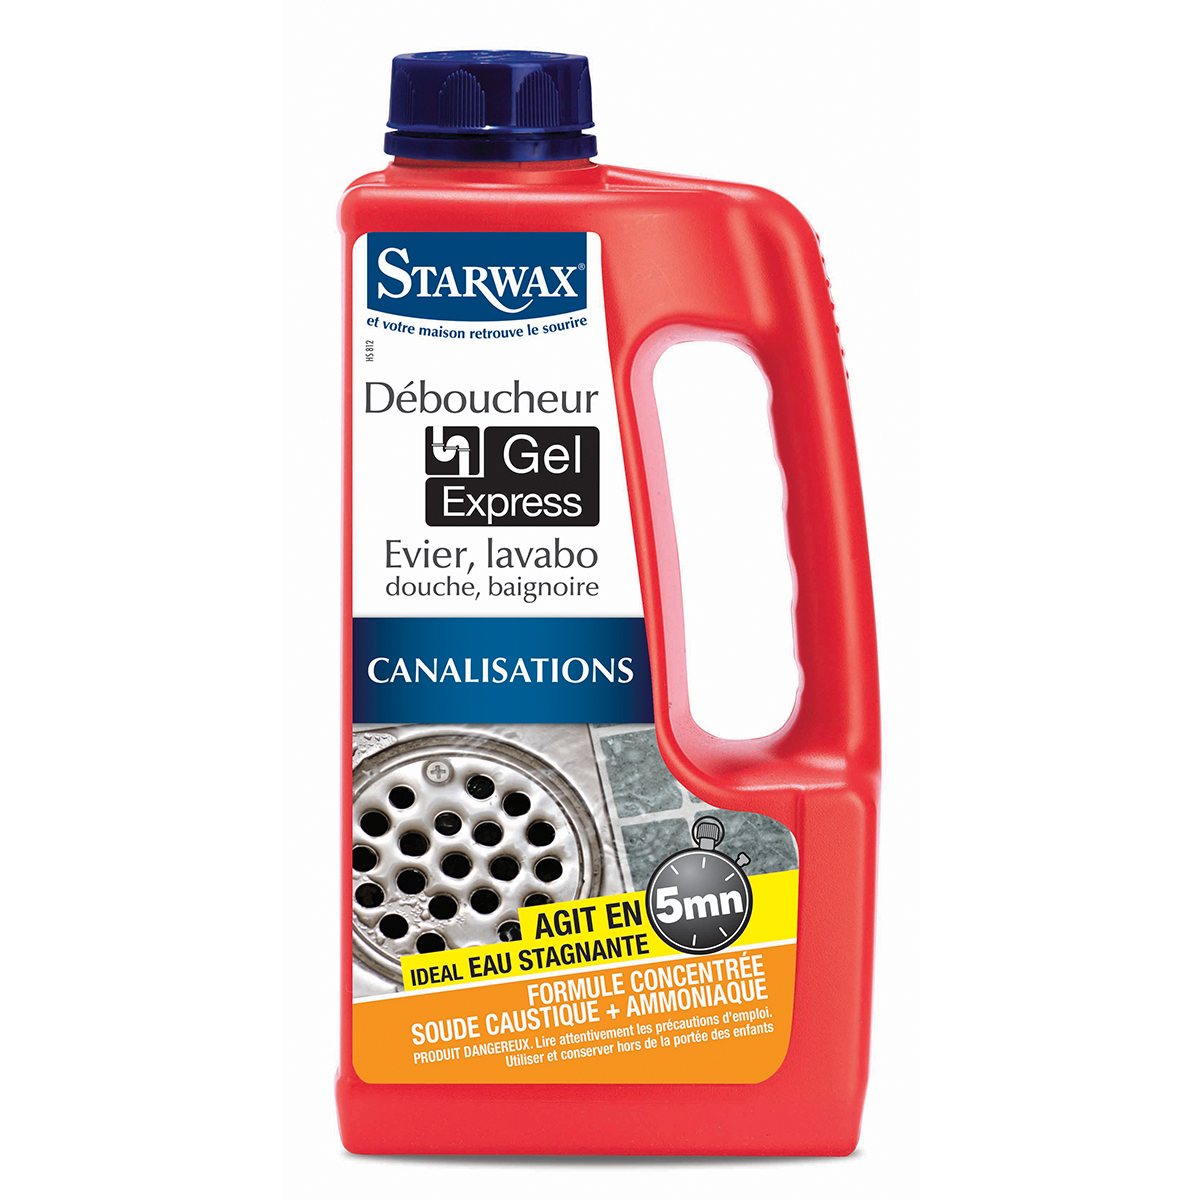 Express 5 min gel drain opener - Starwax